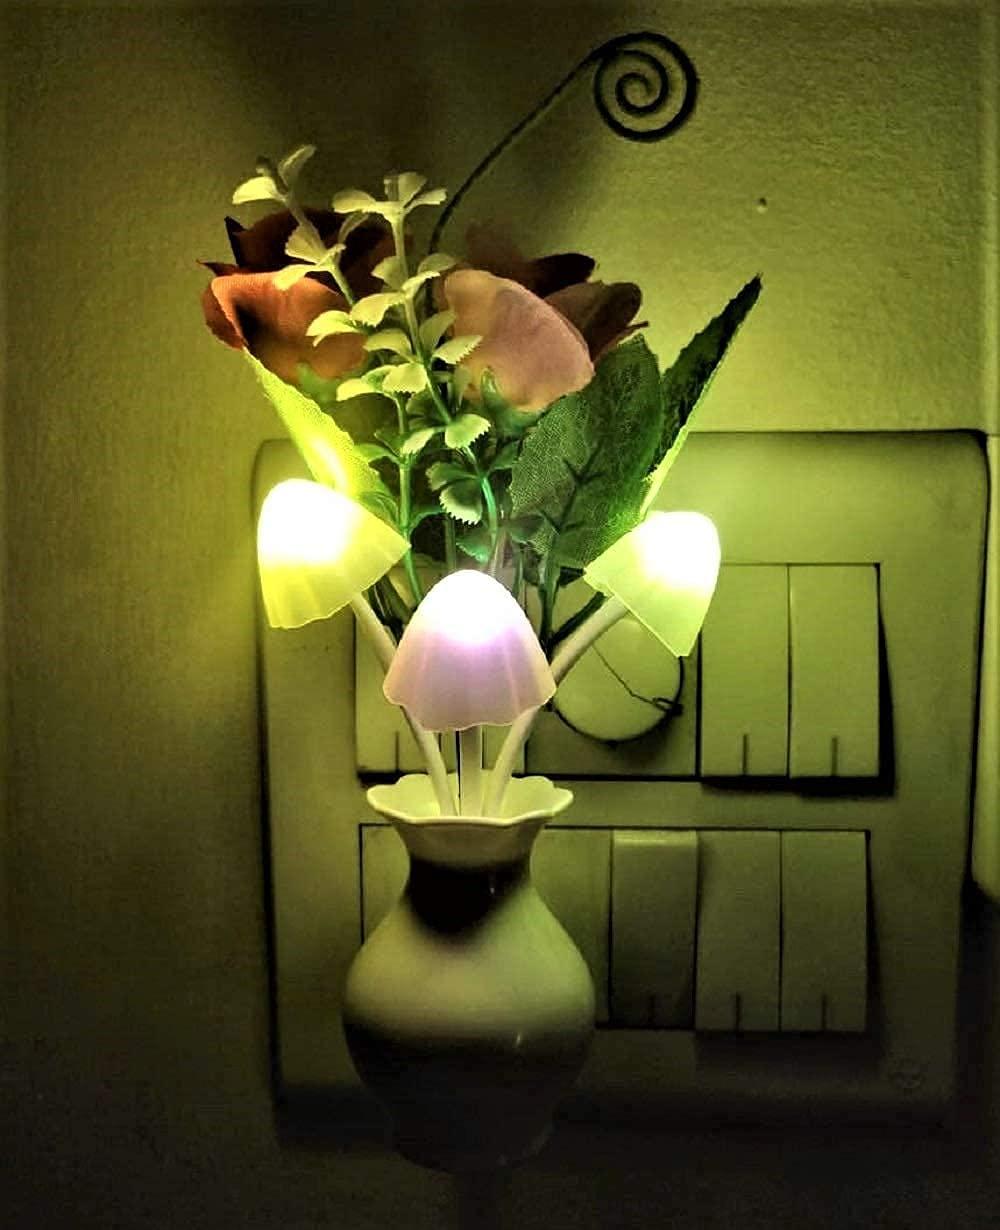 PRO365® Spa Romantic Night Lamp Auto On/Off Sensor(Crown Plug, Power Saver)